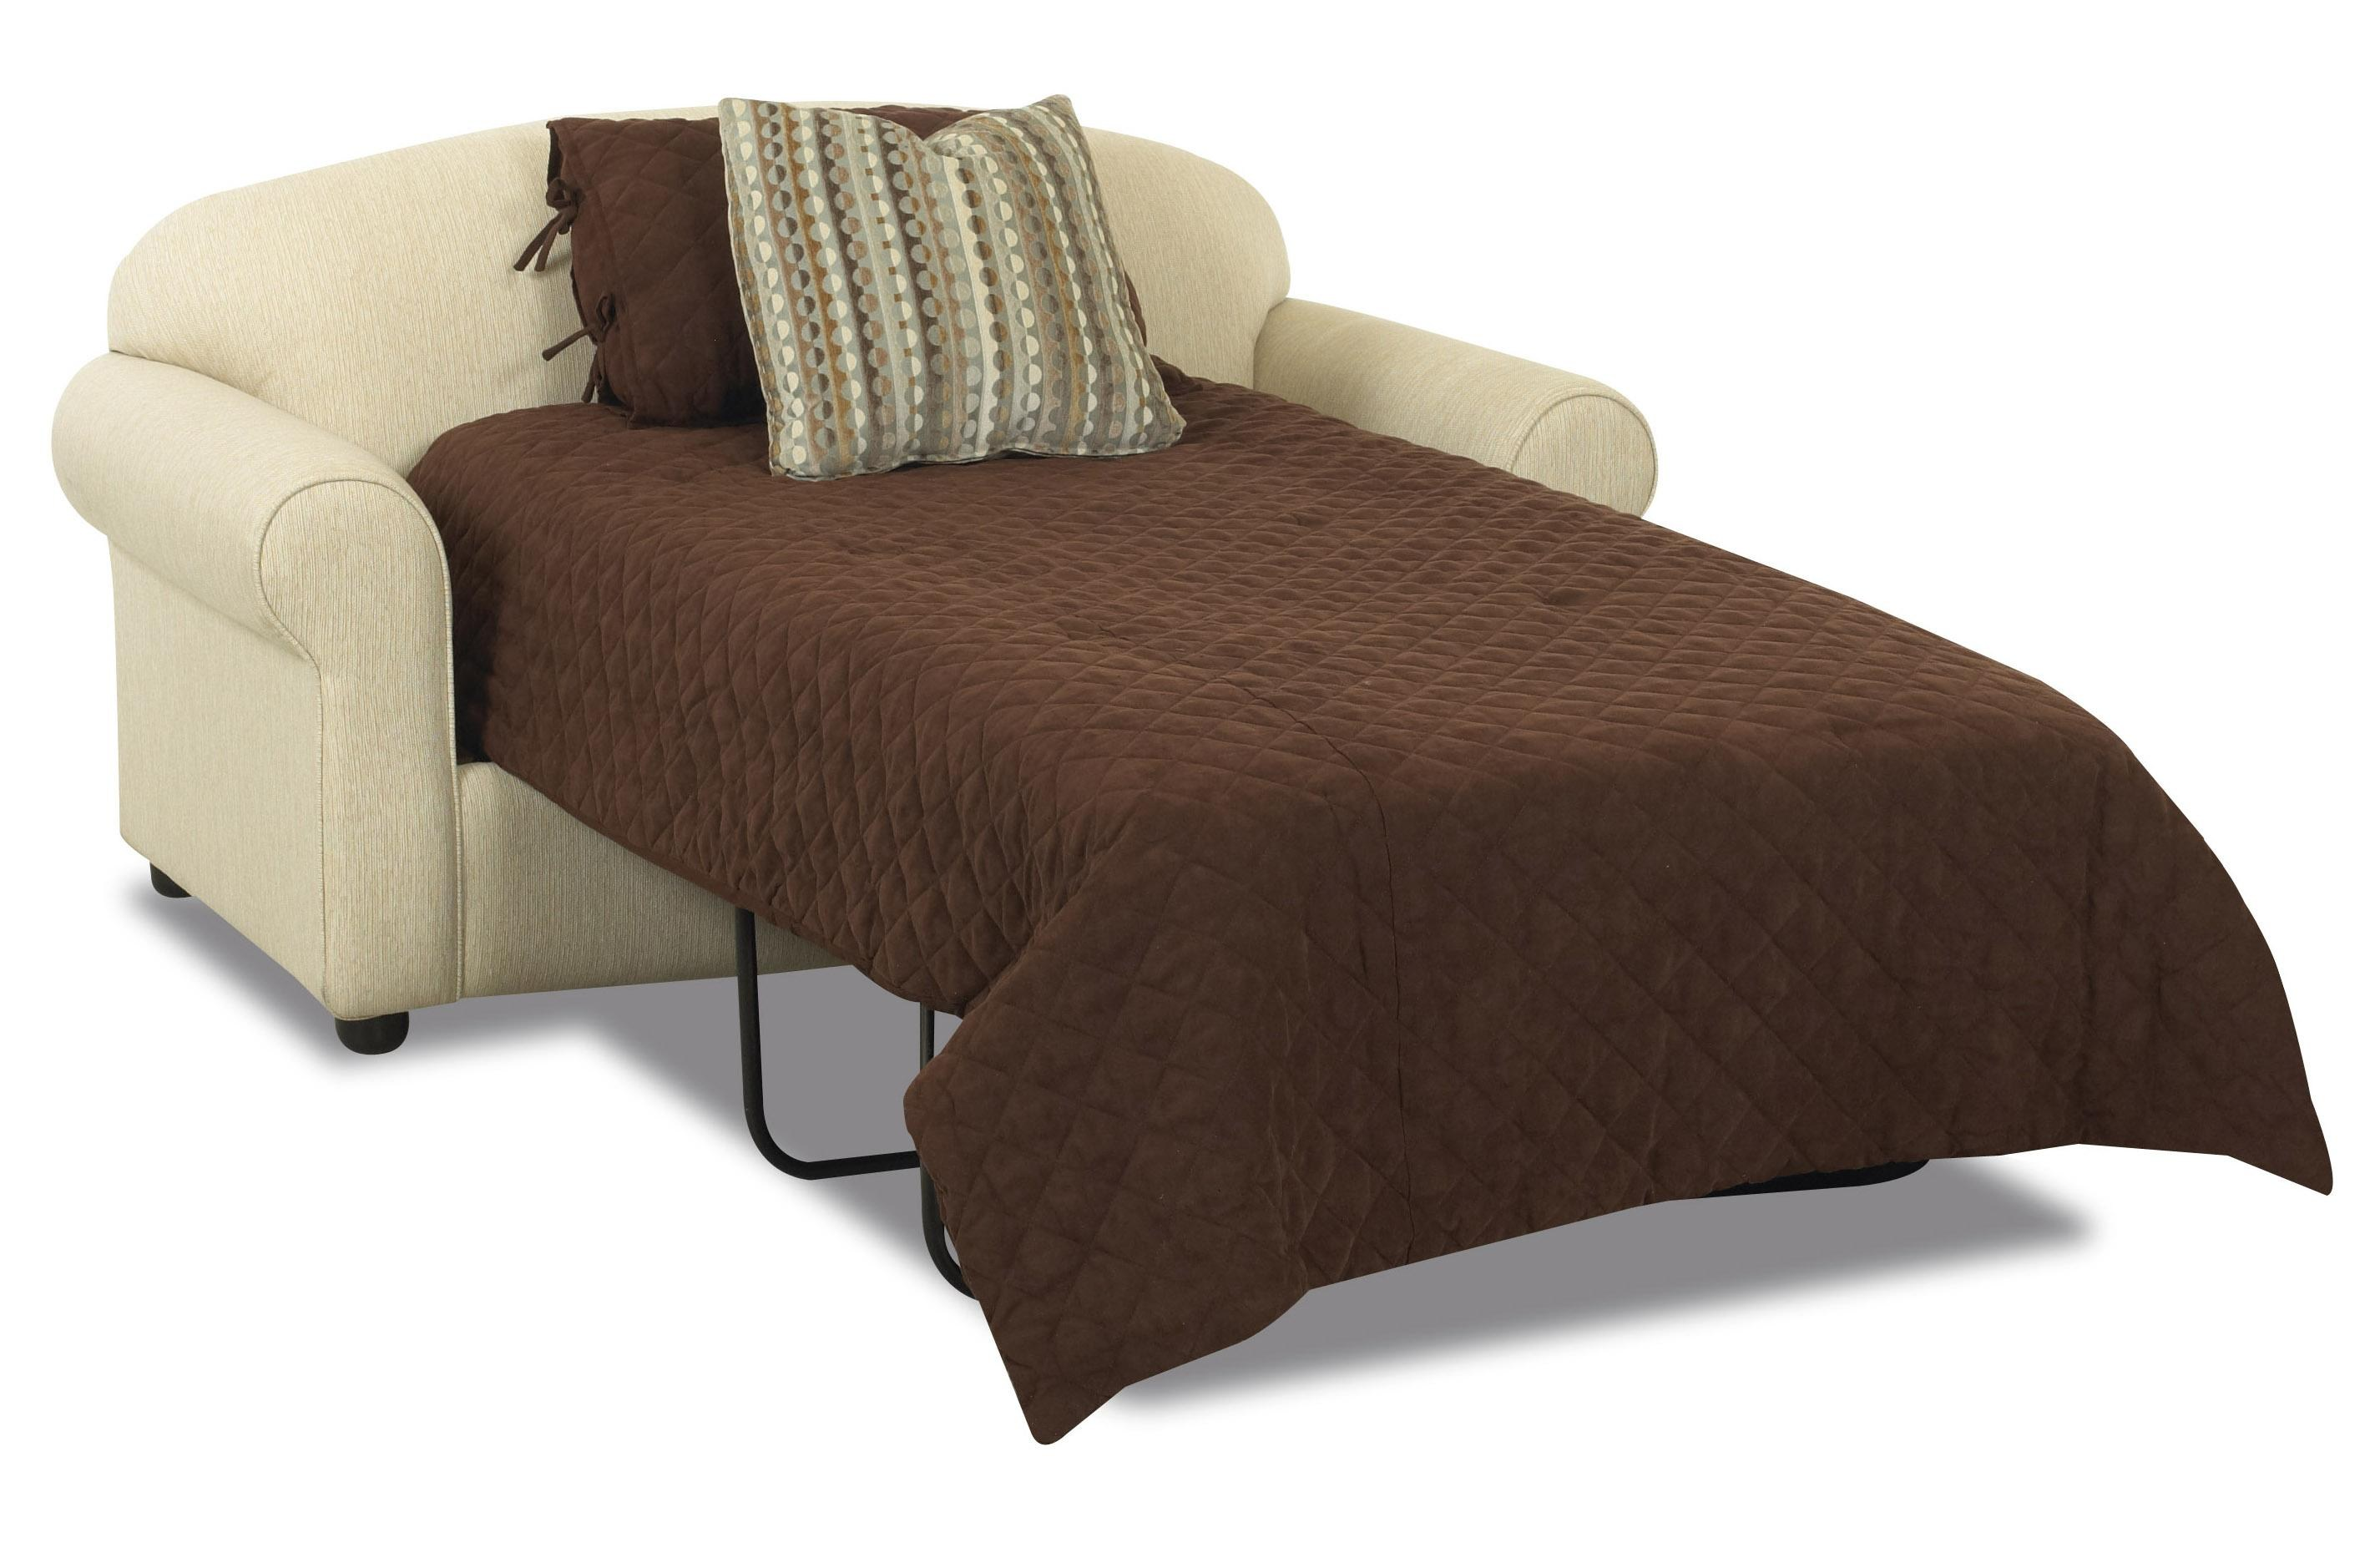 Loveseat double sofa bed Klausner POSSIBILITIES twin sofa bed ... BTHLBEA